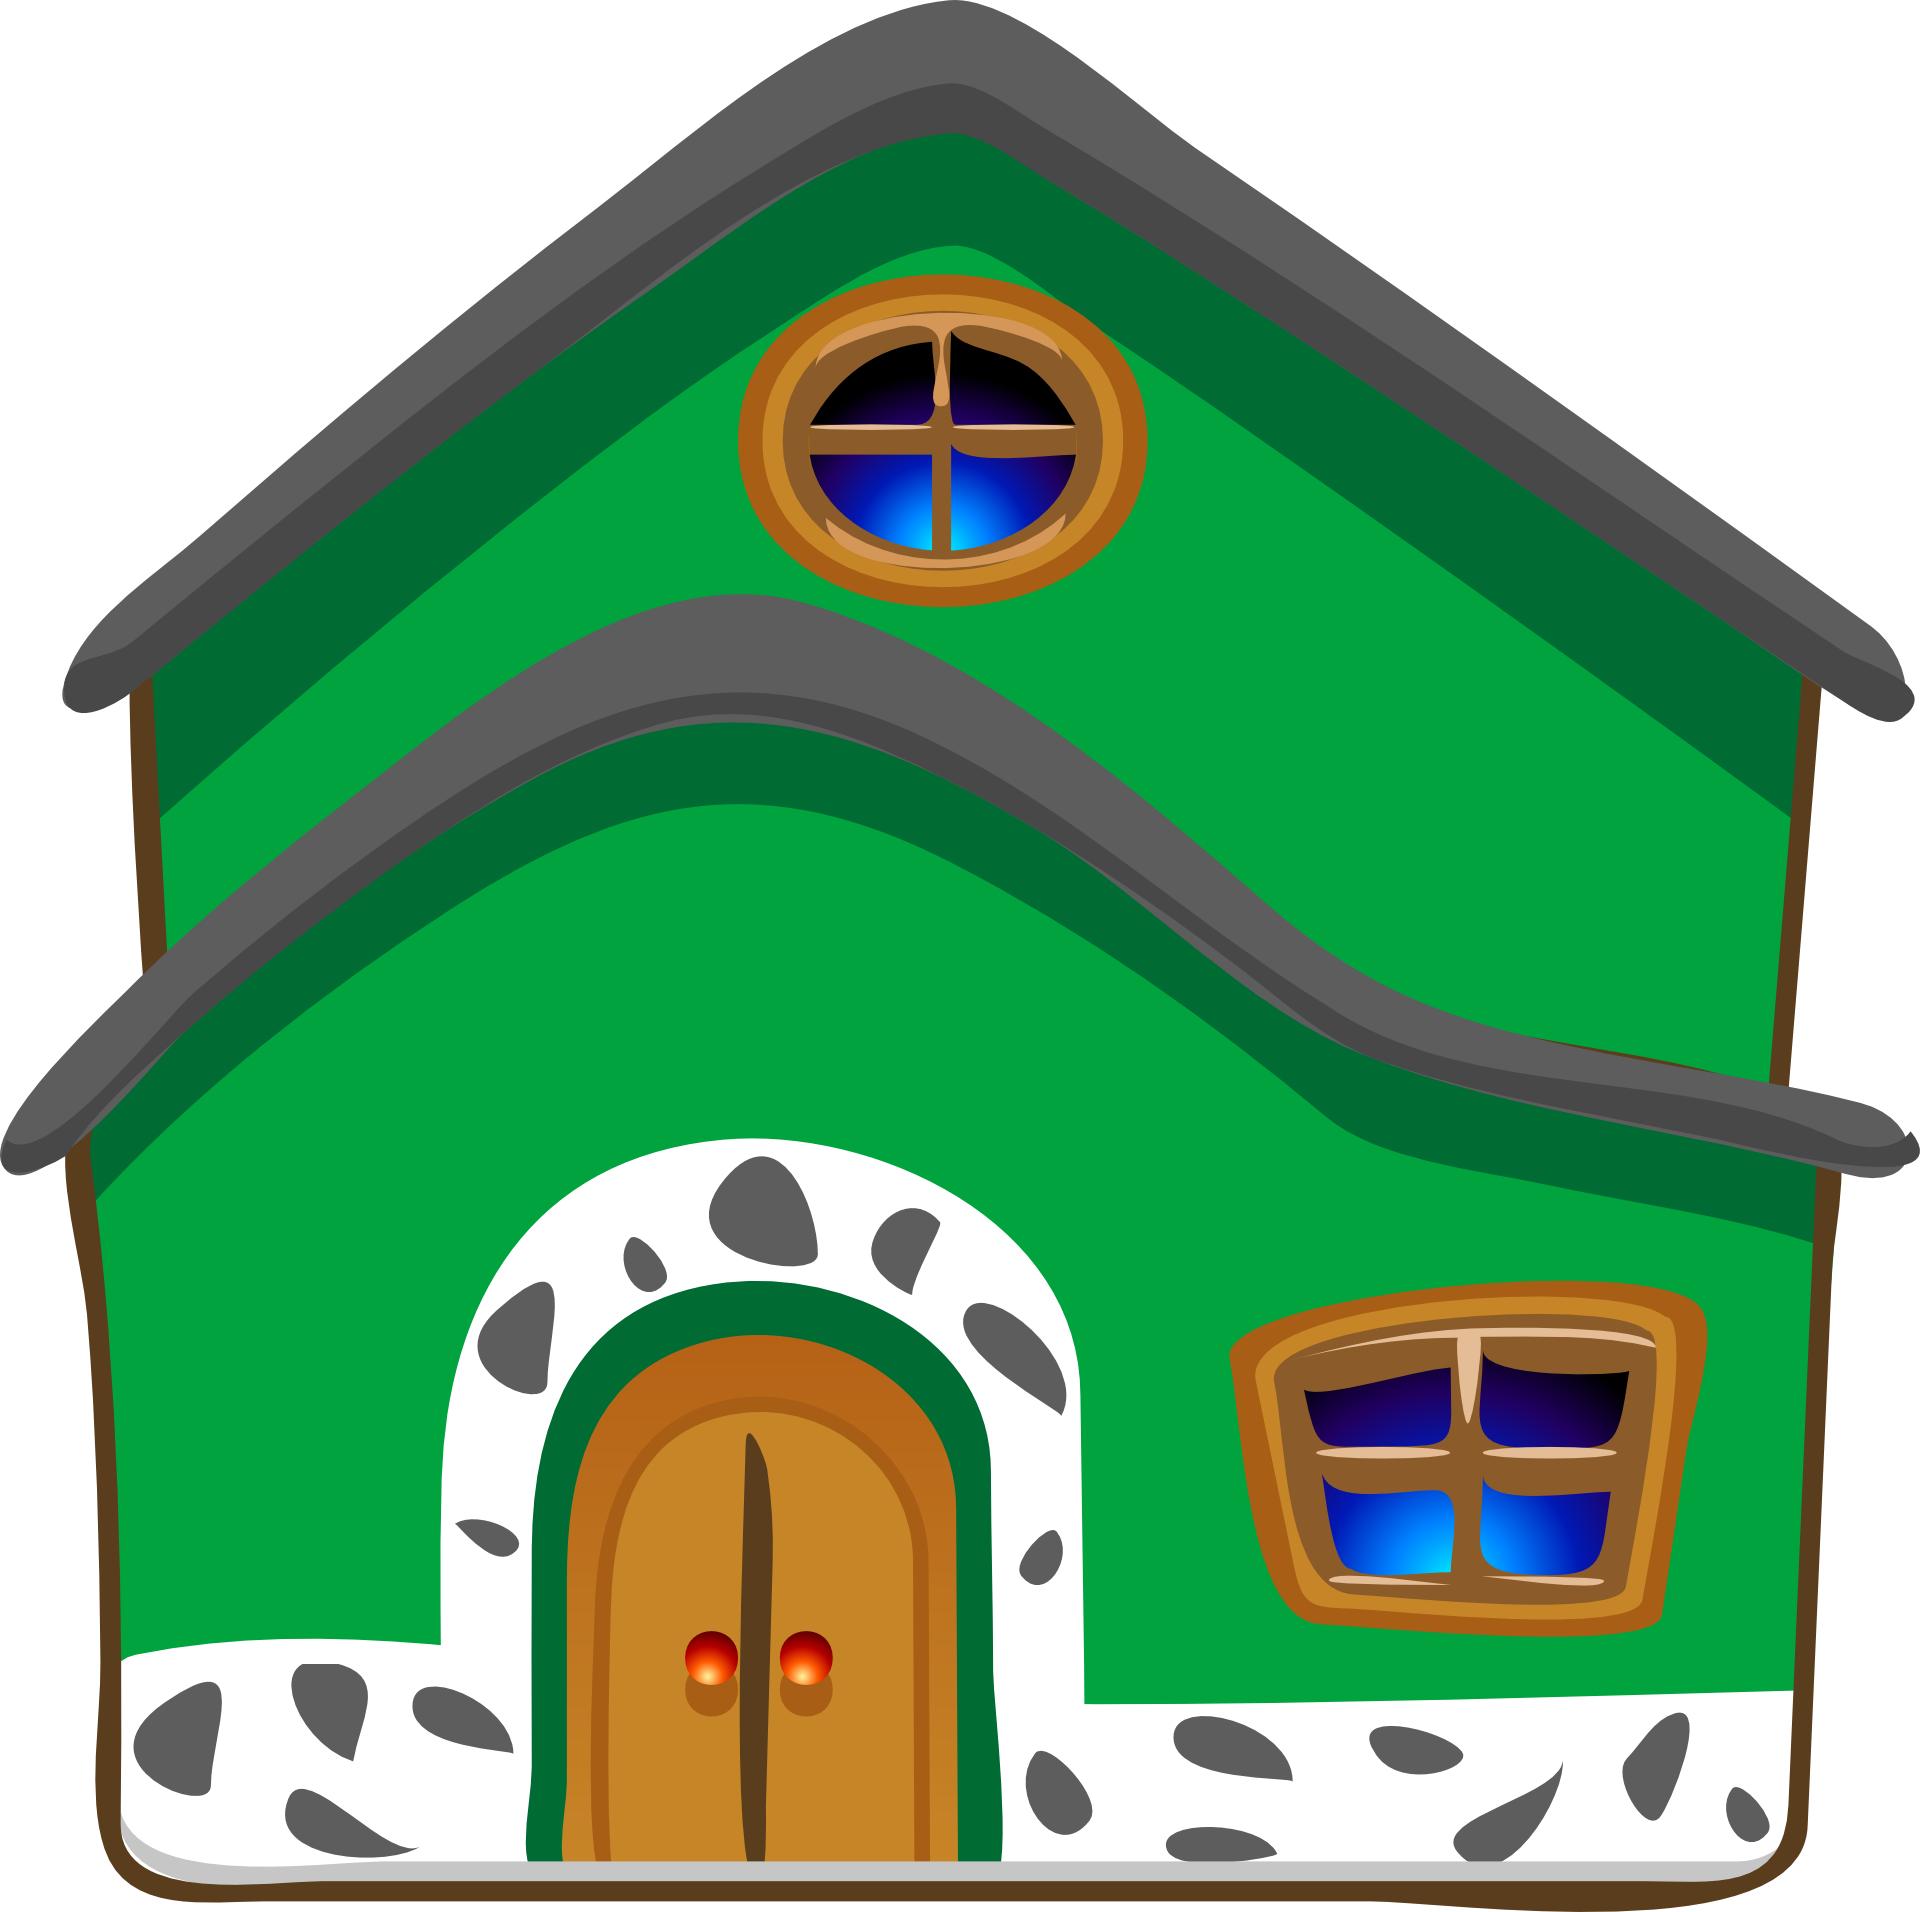 Cartoon green house vector